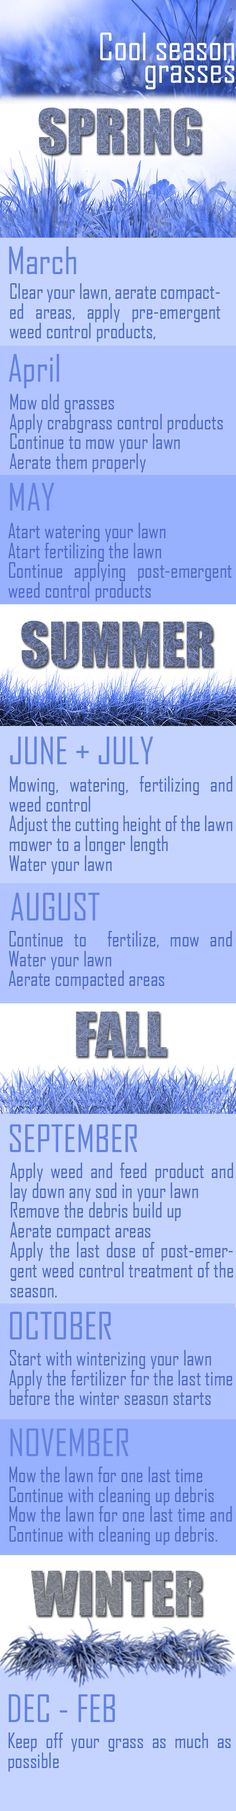 Lawn fertilizing schedule for cool-season grasses | www.goldensunlandscapingsvc.com